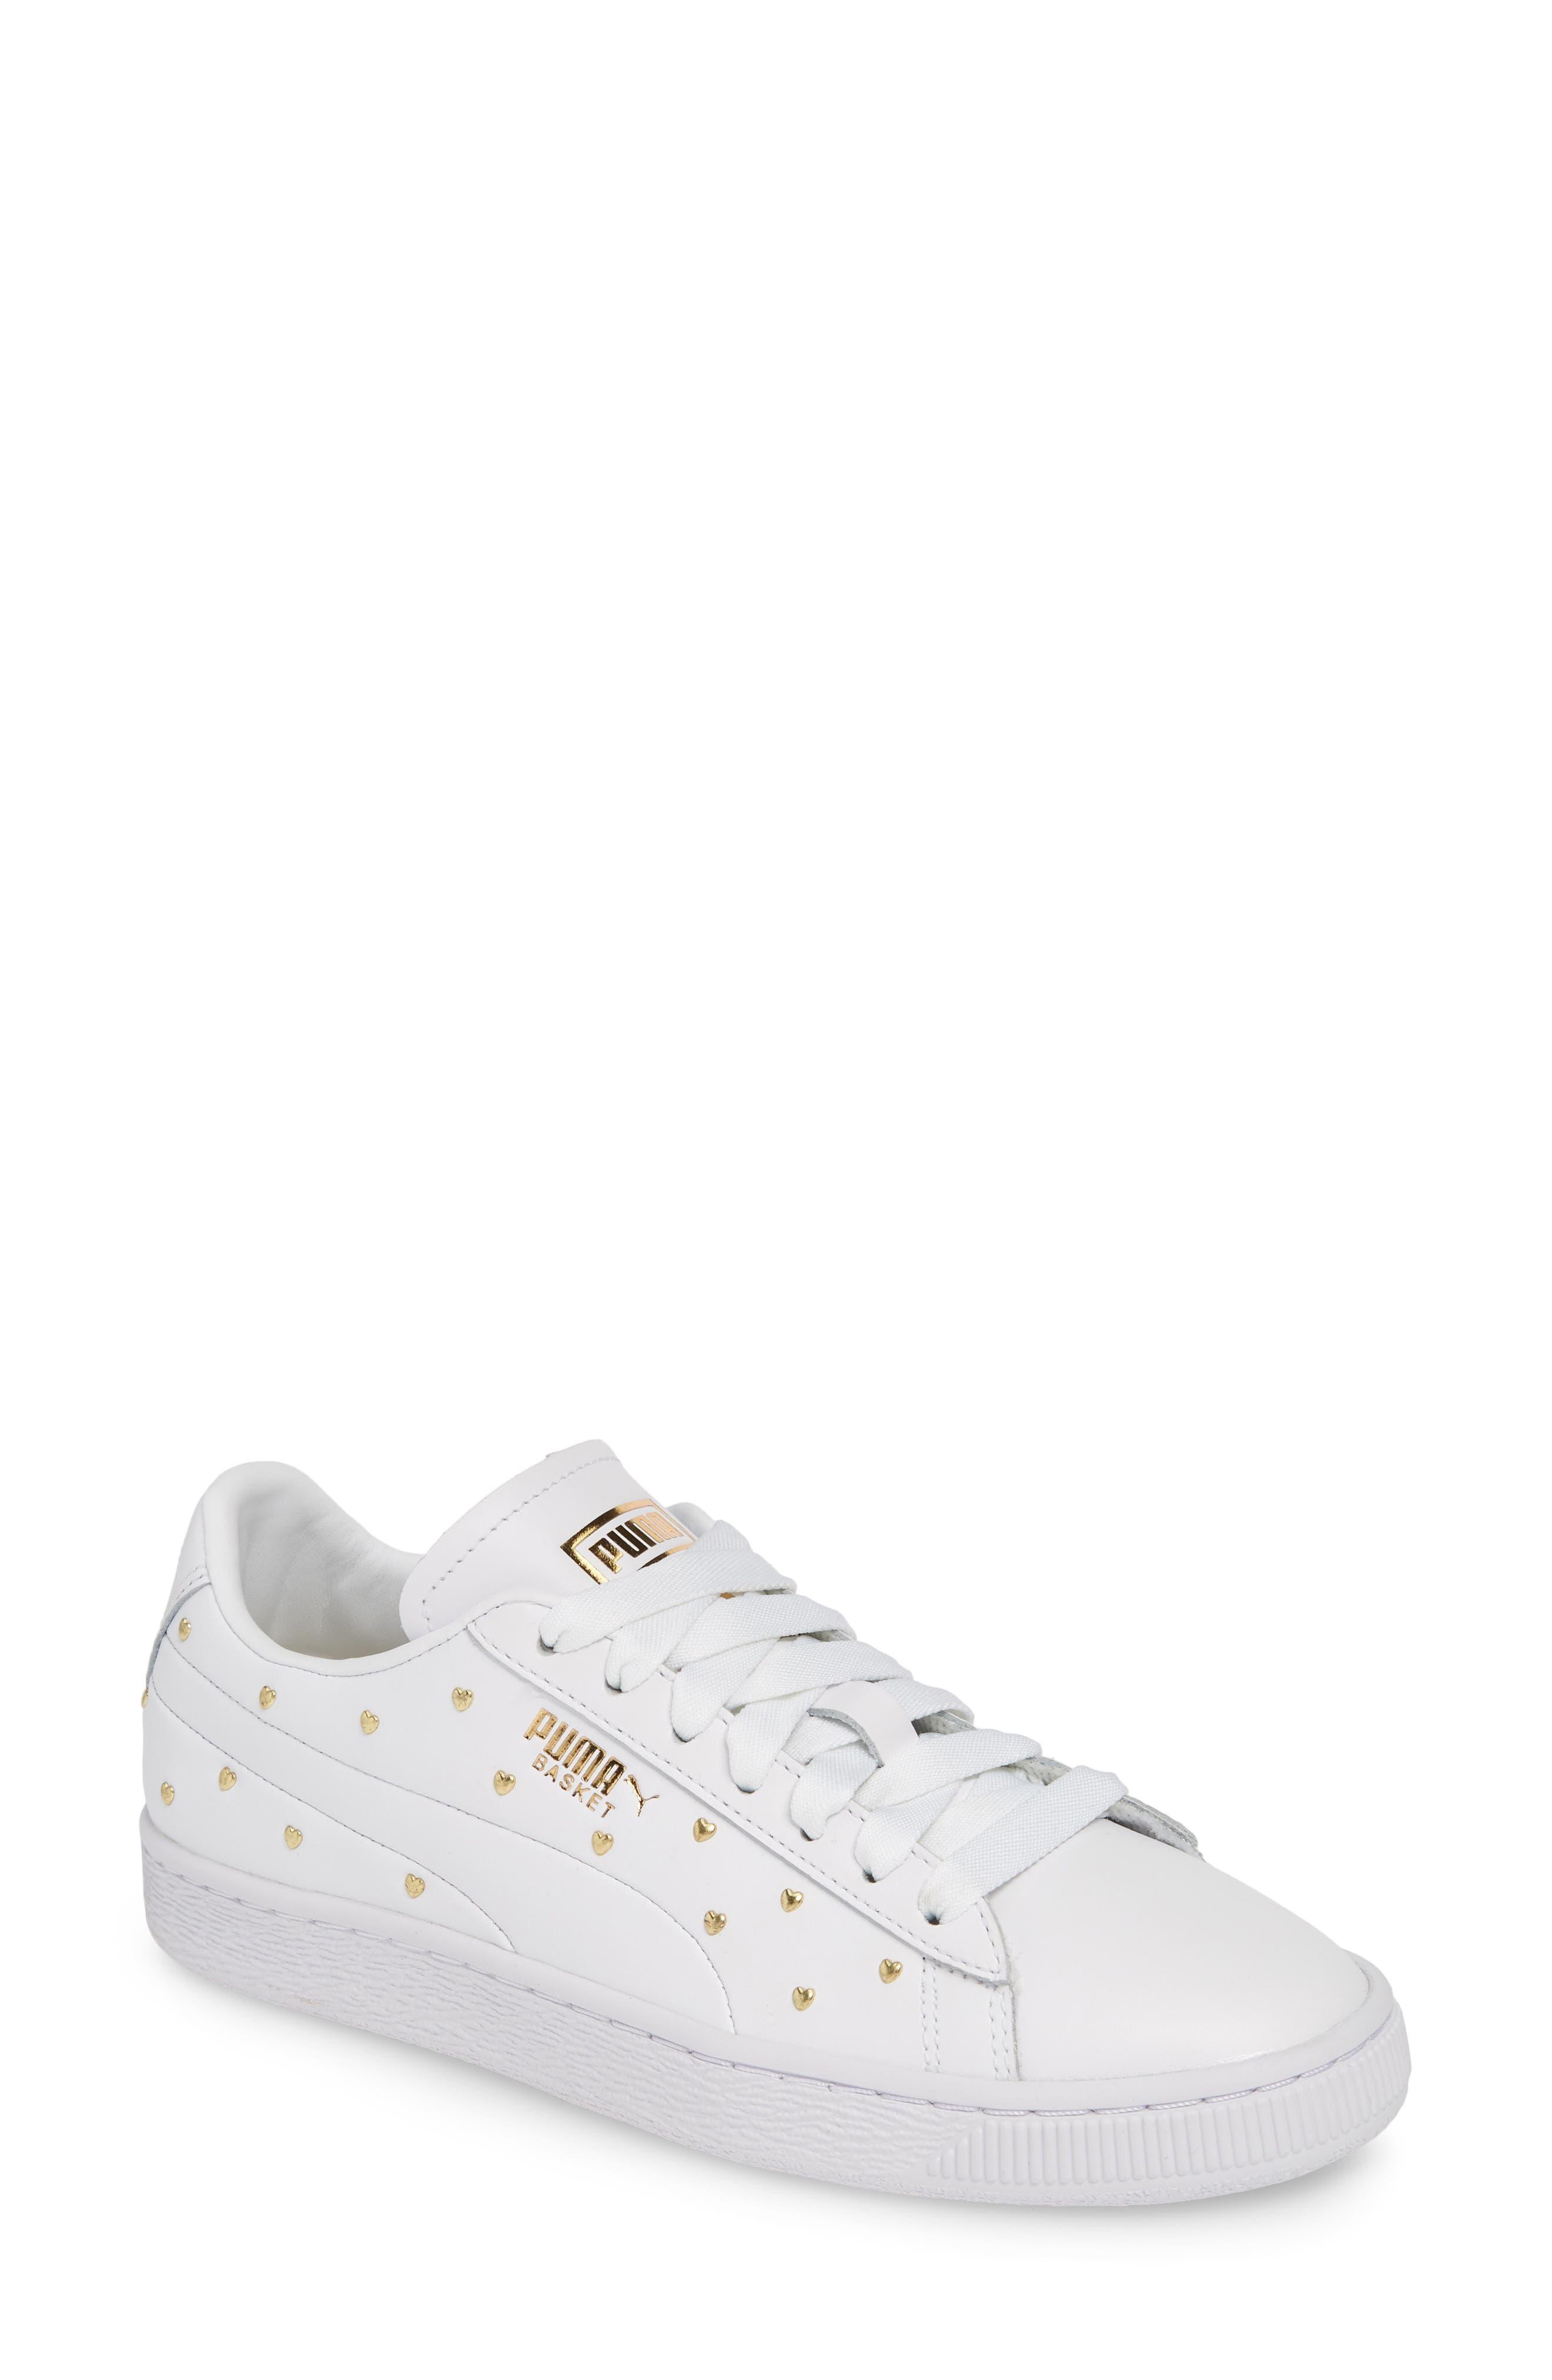 Puma Basket Studs Sneaker, White